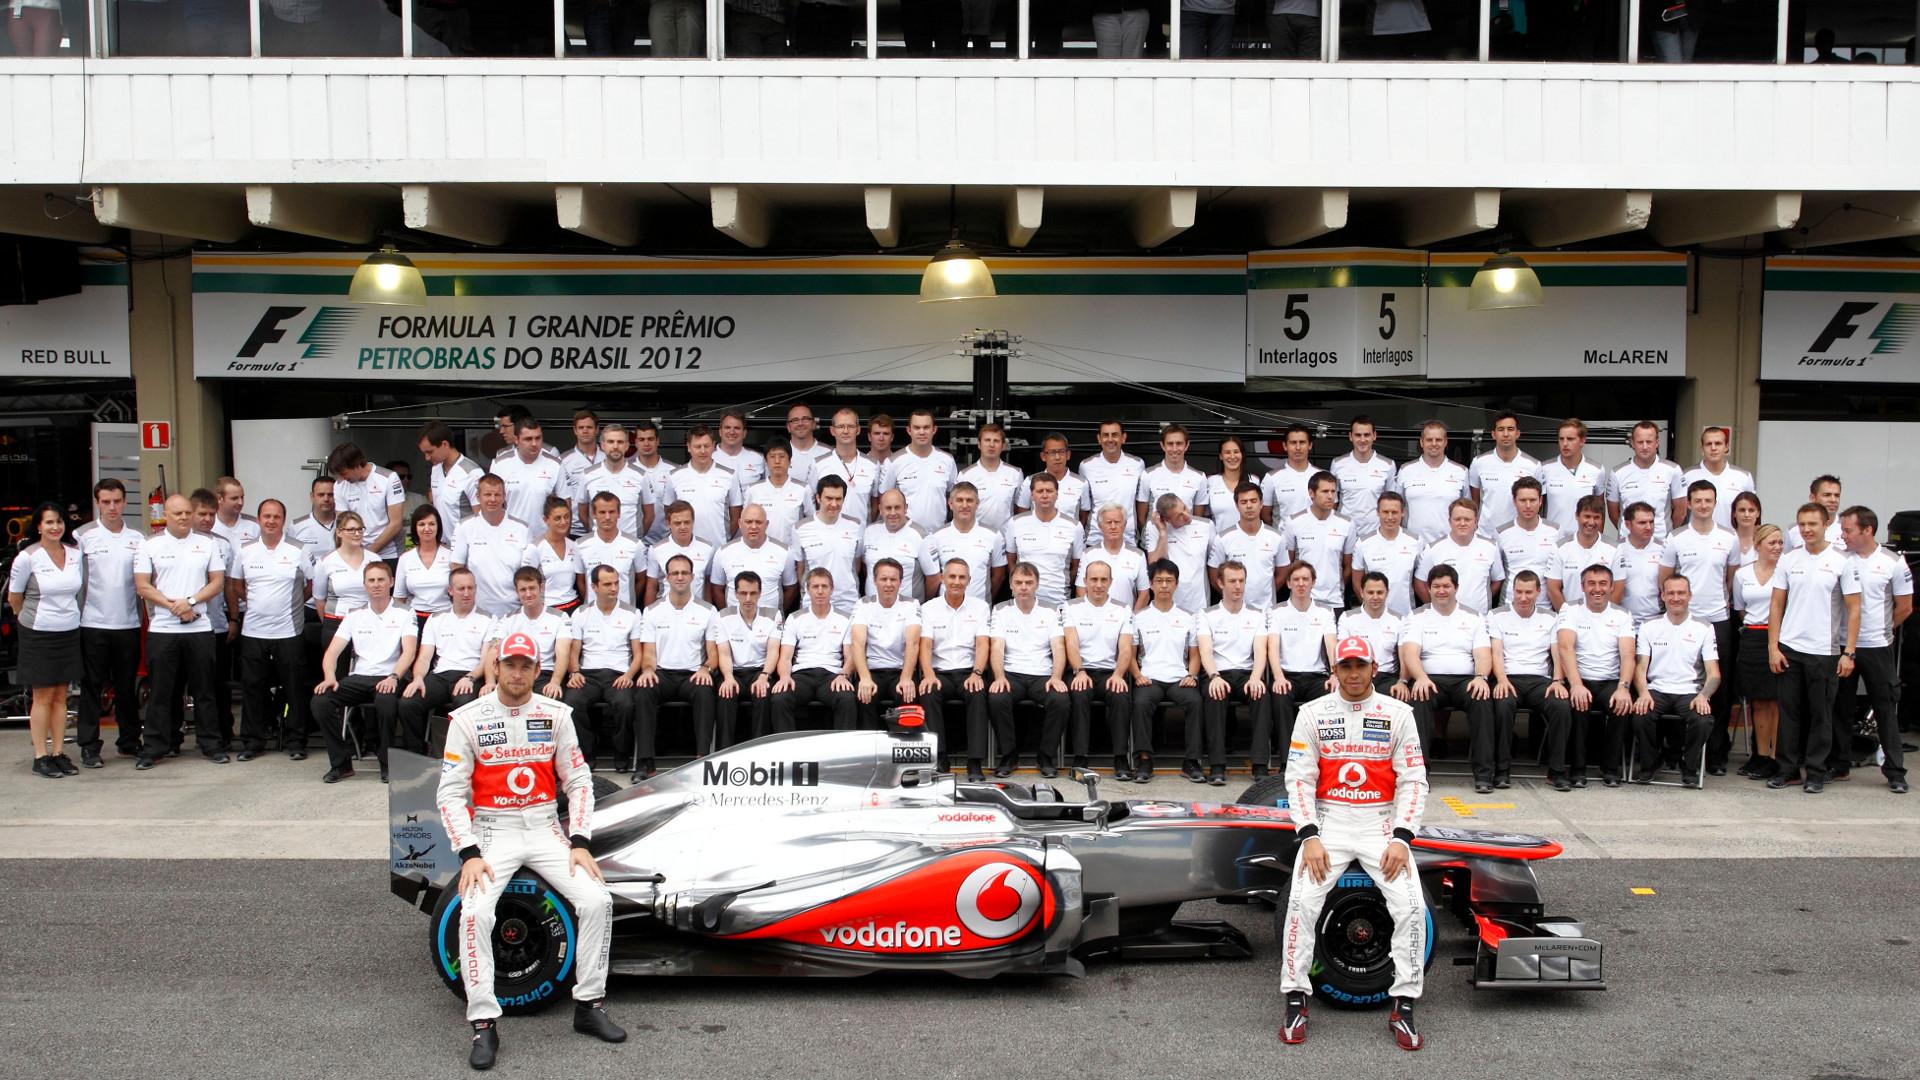 Red Bull F1 Wallpaper